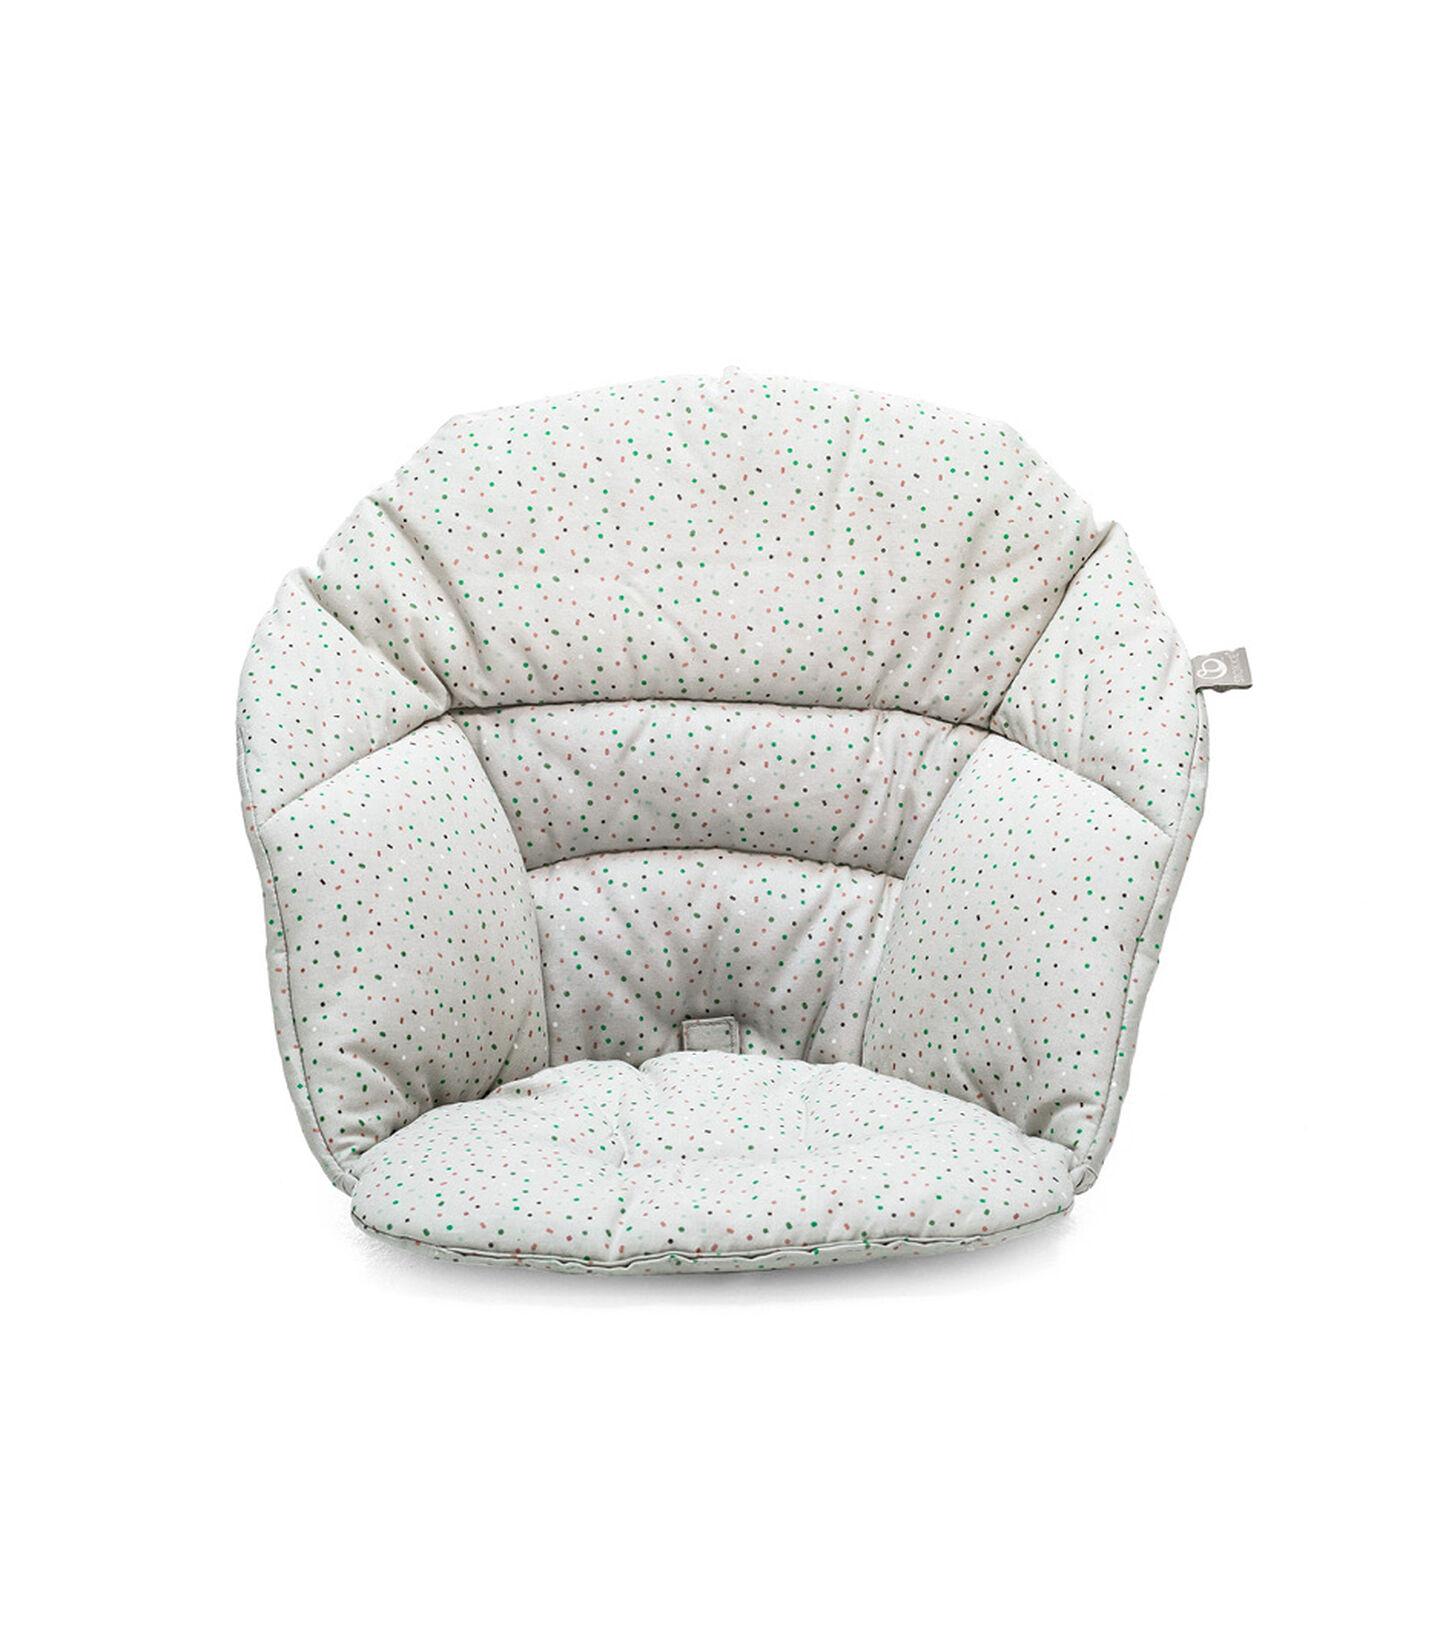 Stokke® Clikk™ Cushion Soft Grey Sprinkles, Grey Sprinkles, mainview view 2